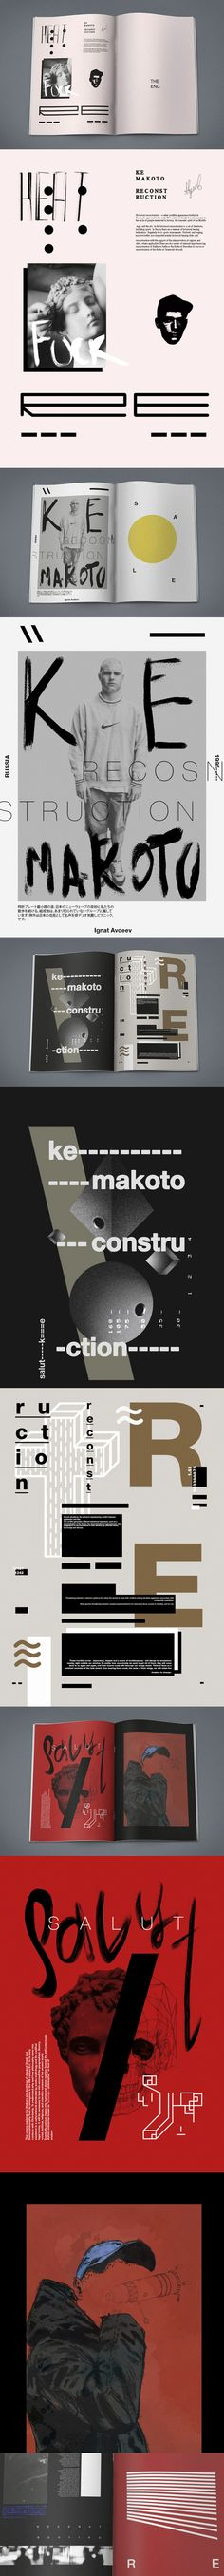 Ke Макото Reconstruction 2013 Art direction and layout: Ignat Avdeev Size: 420x297mm (open size)